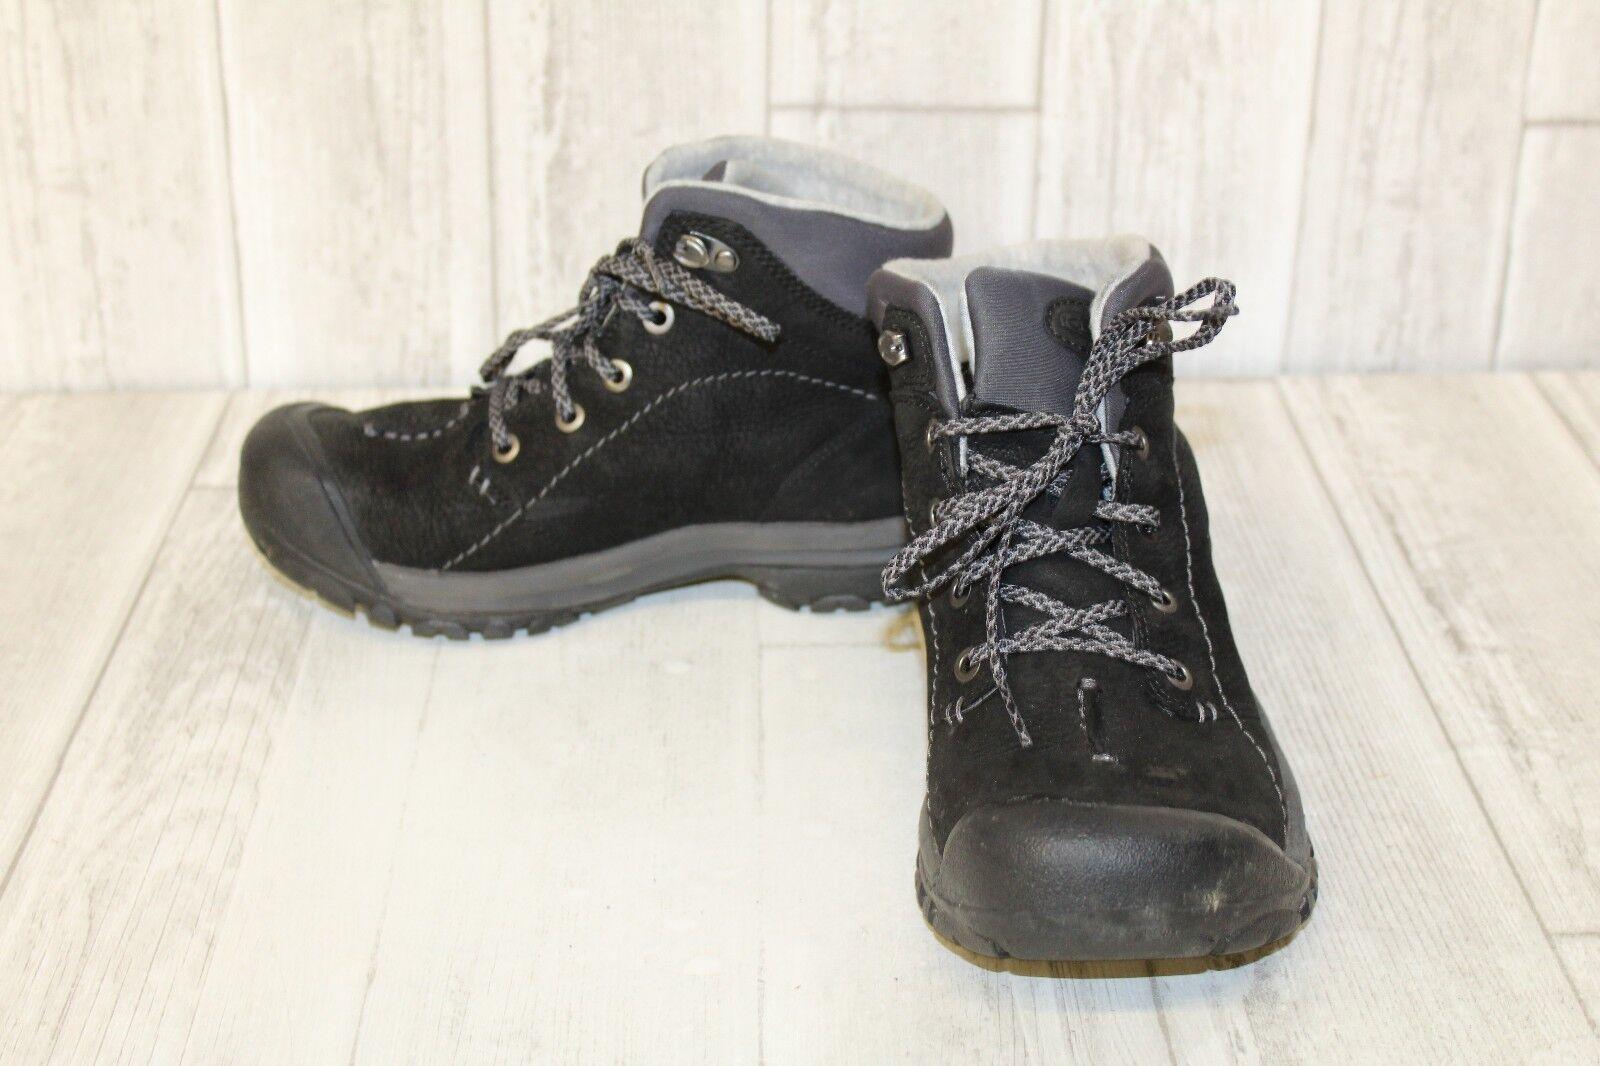 Keen Kaci Winter Mid WP Boots - Women's Size 6.5, Black